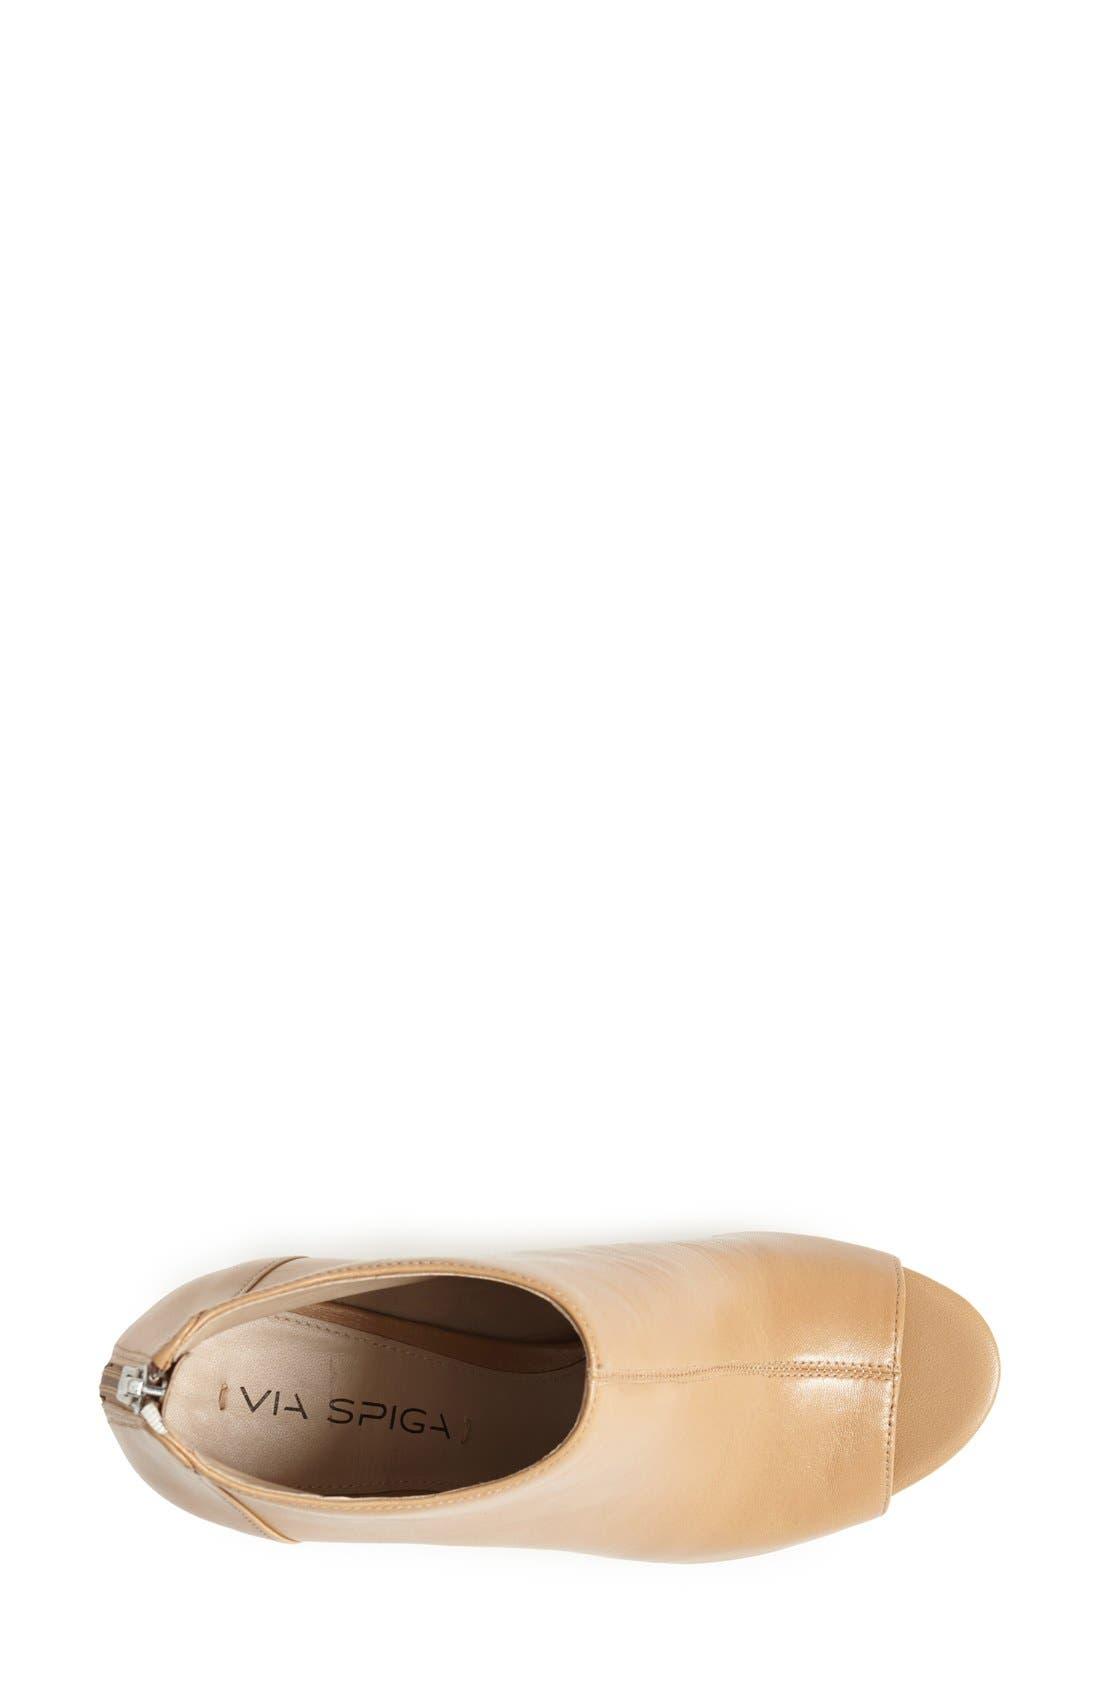 Alternate Image 3  - Via Spiga 'Nessa 2' Leather Open Toe Bootie (Women)